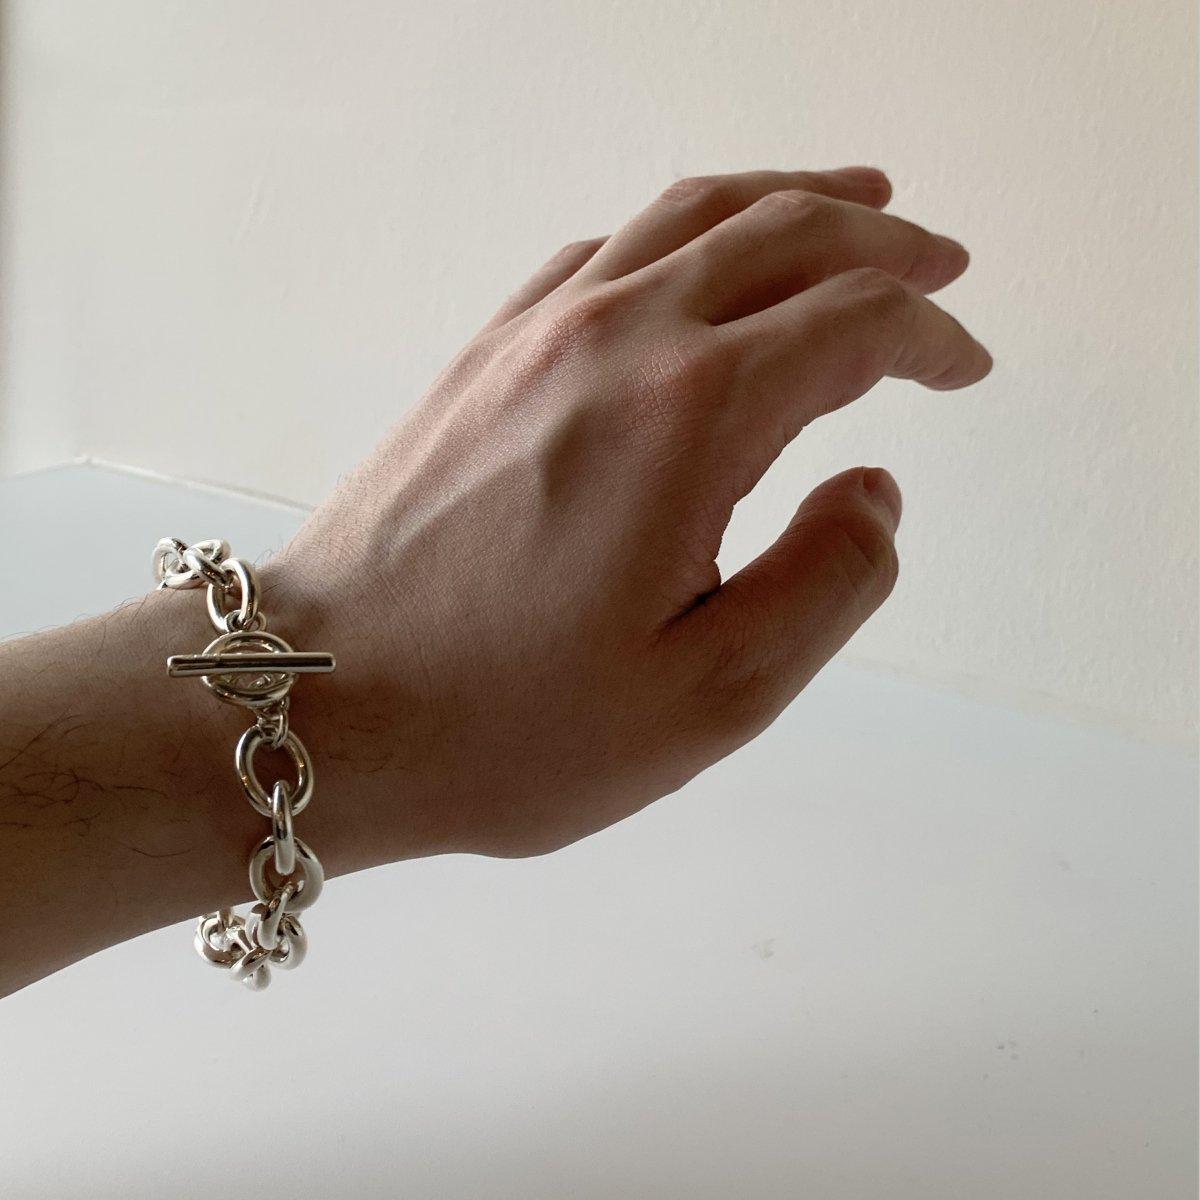 vo chain bracelet M -mens-